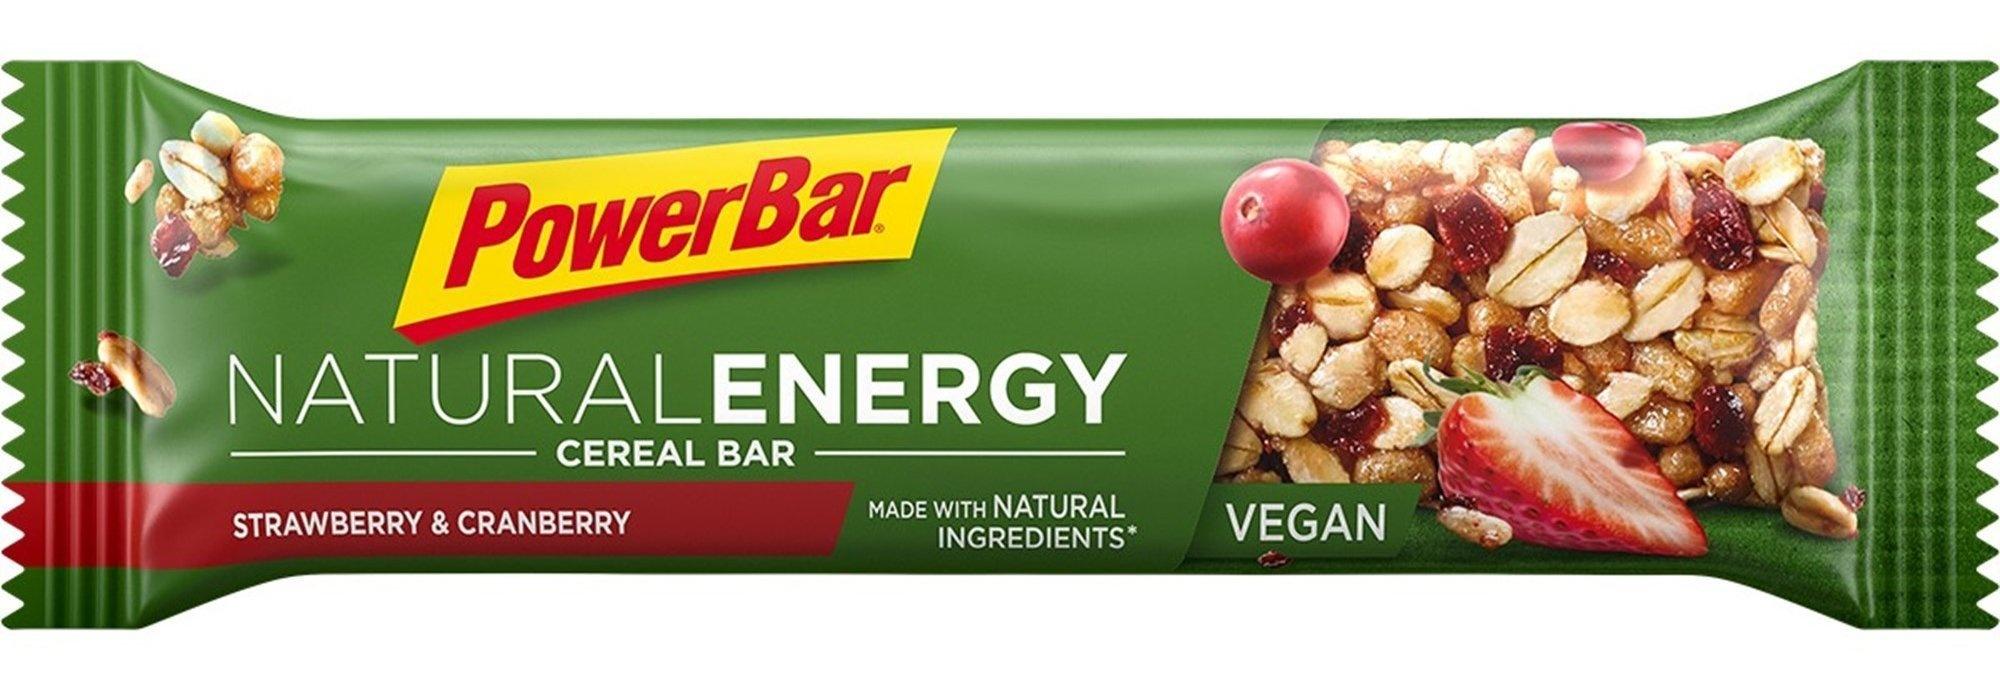 PowerBar Natural Energy Strawberry & Cranberry